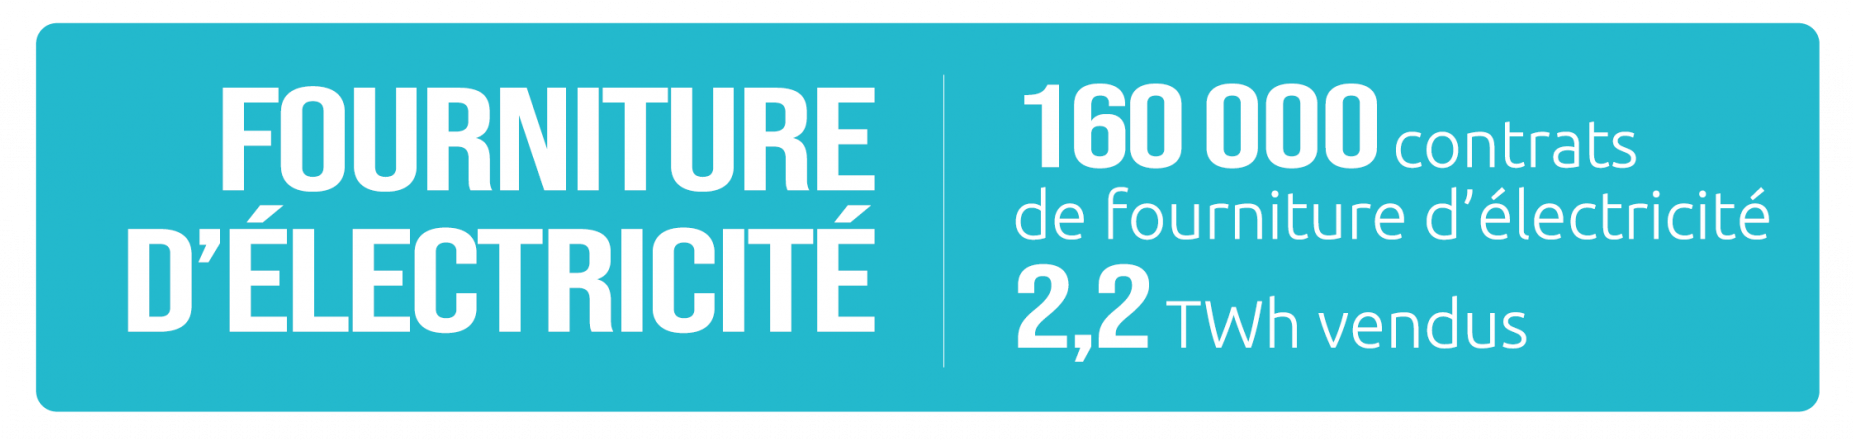 FOURNITURE ELECTRICITE 2021